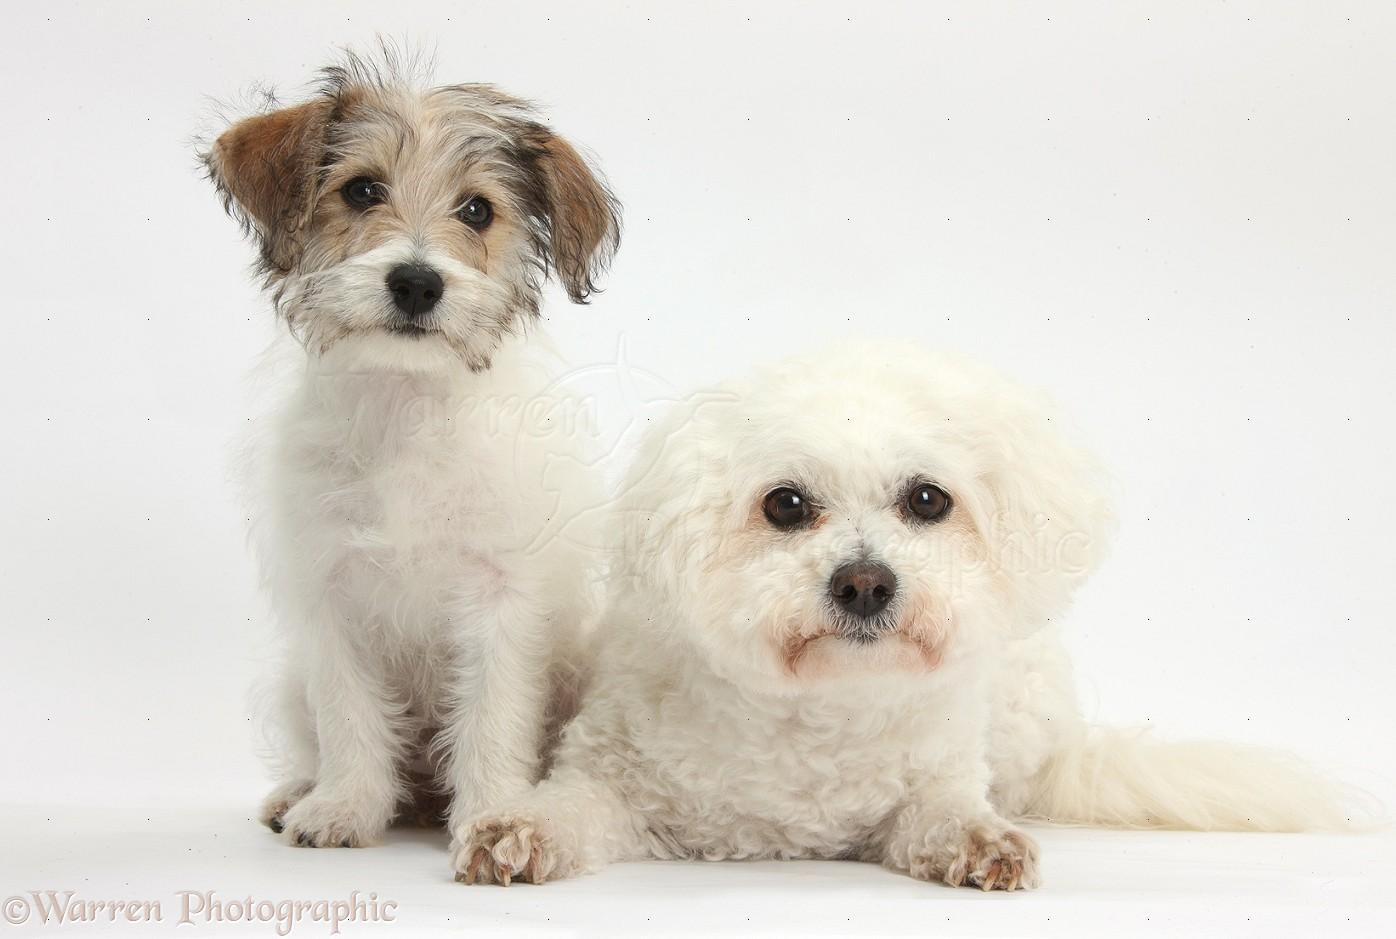 ... Bichon Frisé bitch, Pipa , with Bichon x Jack Russell Terrier